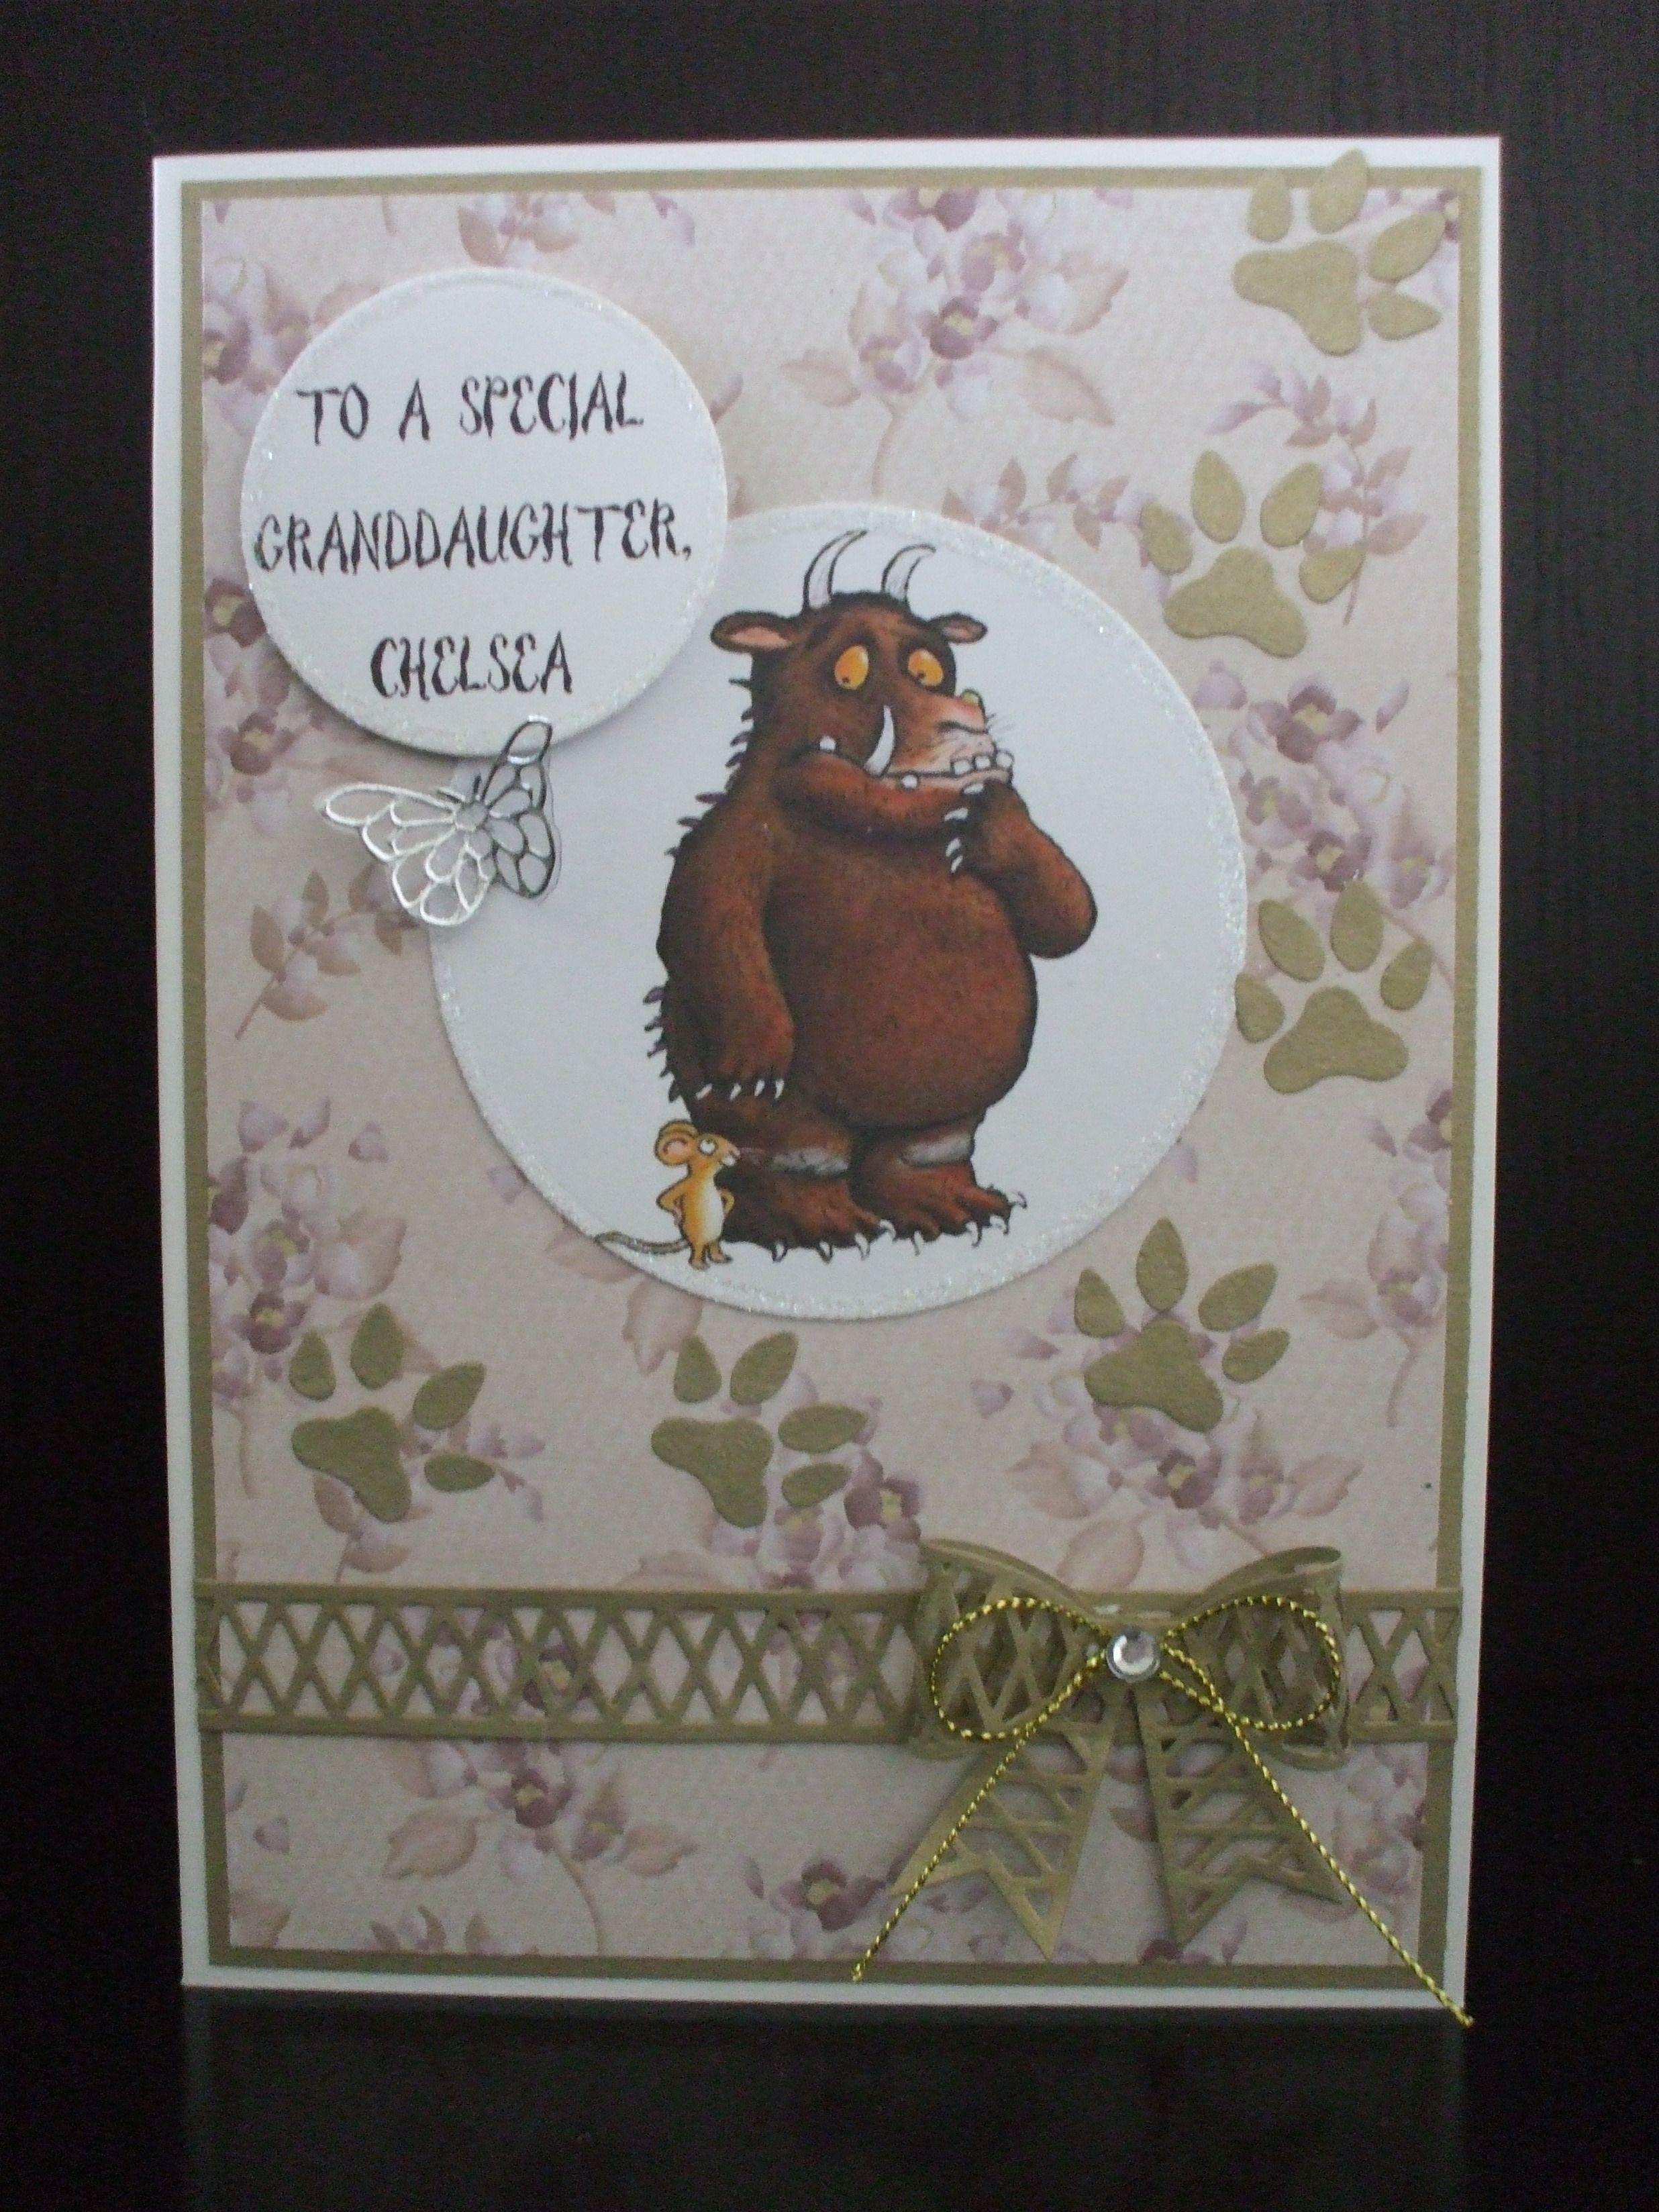 Handmade Gruffalo 1st Birthday Granddaughter Kids Cards Punch Cards Pretty Cards